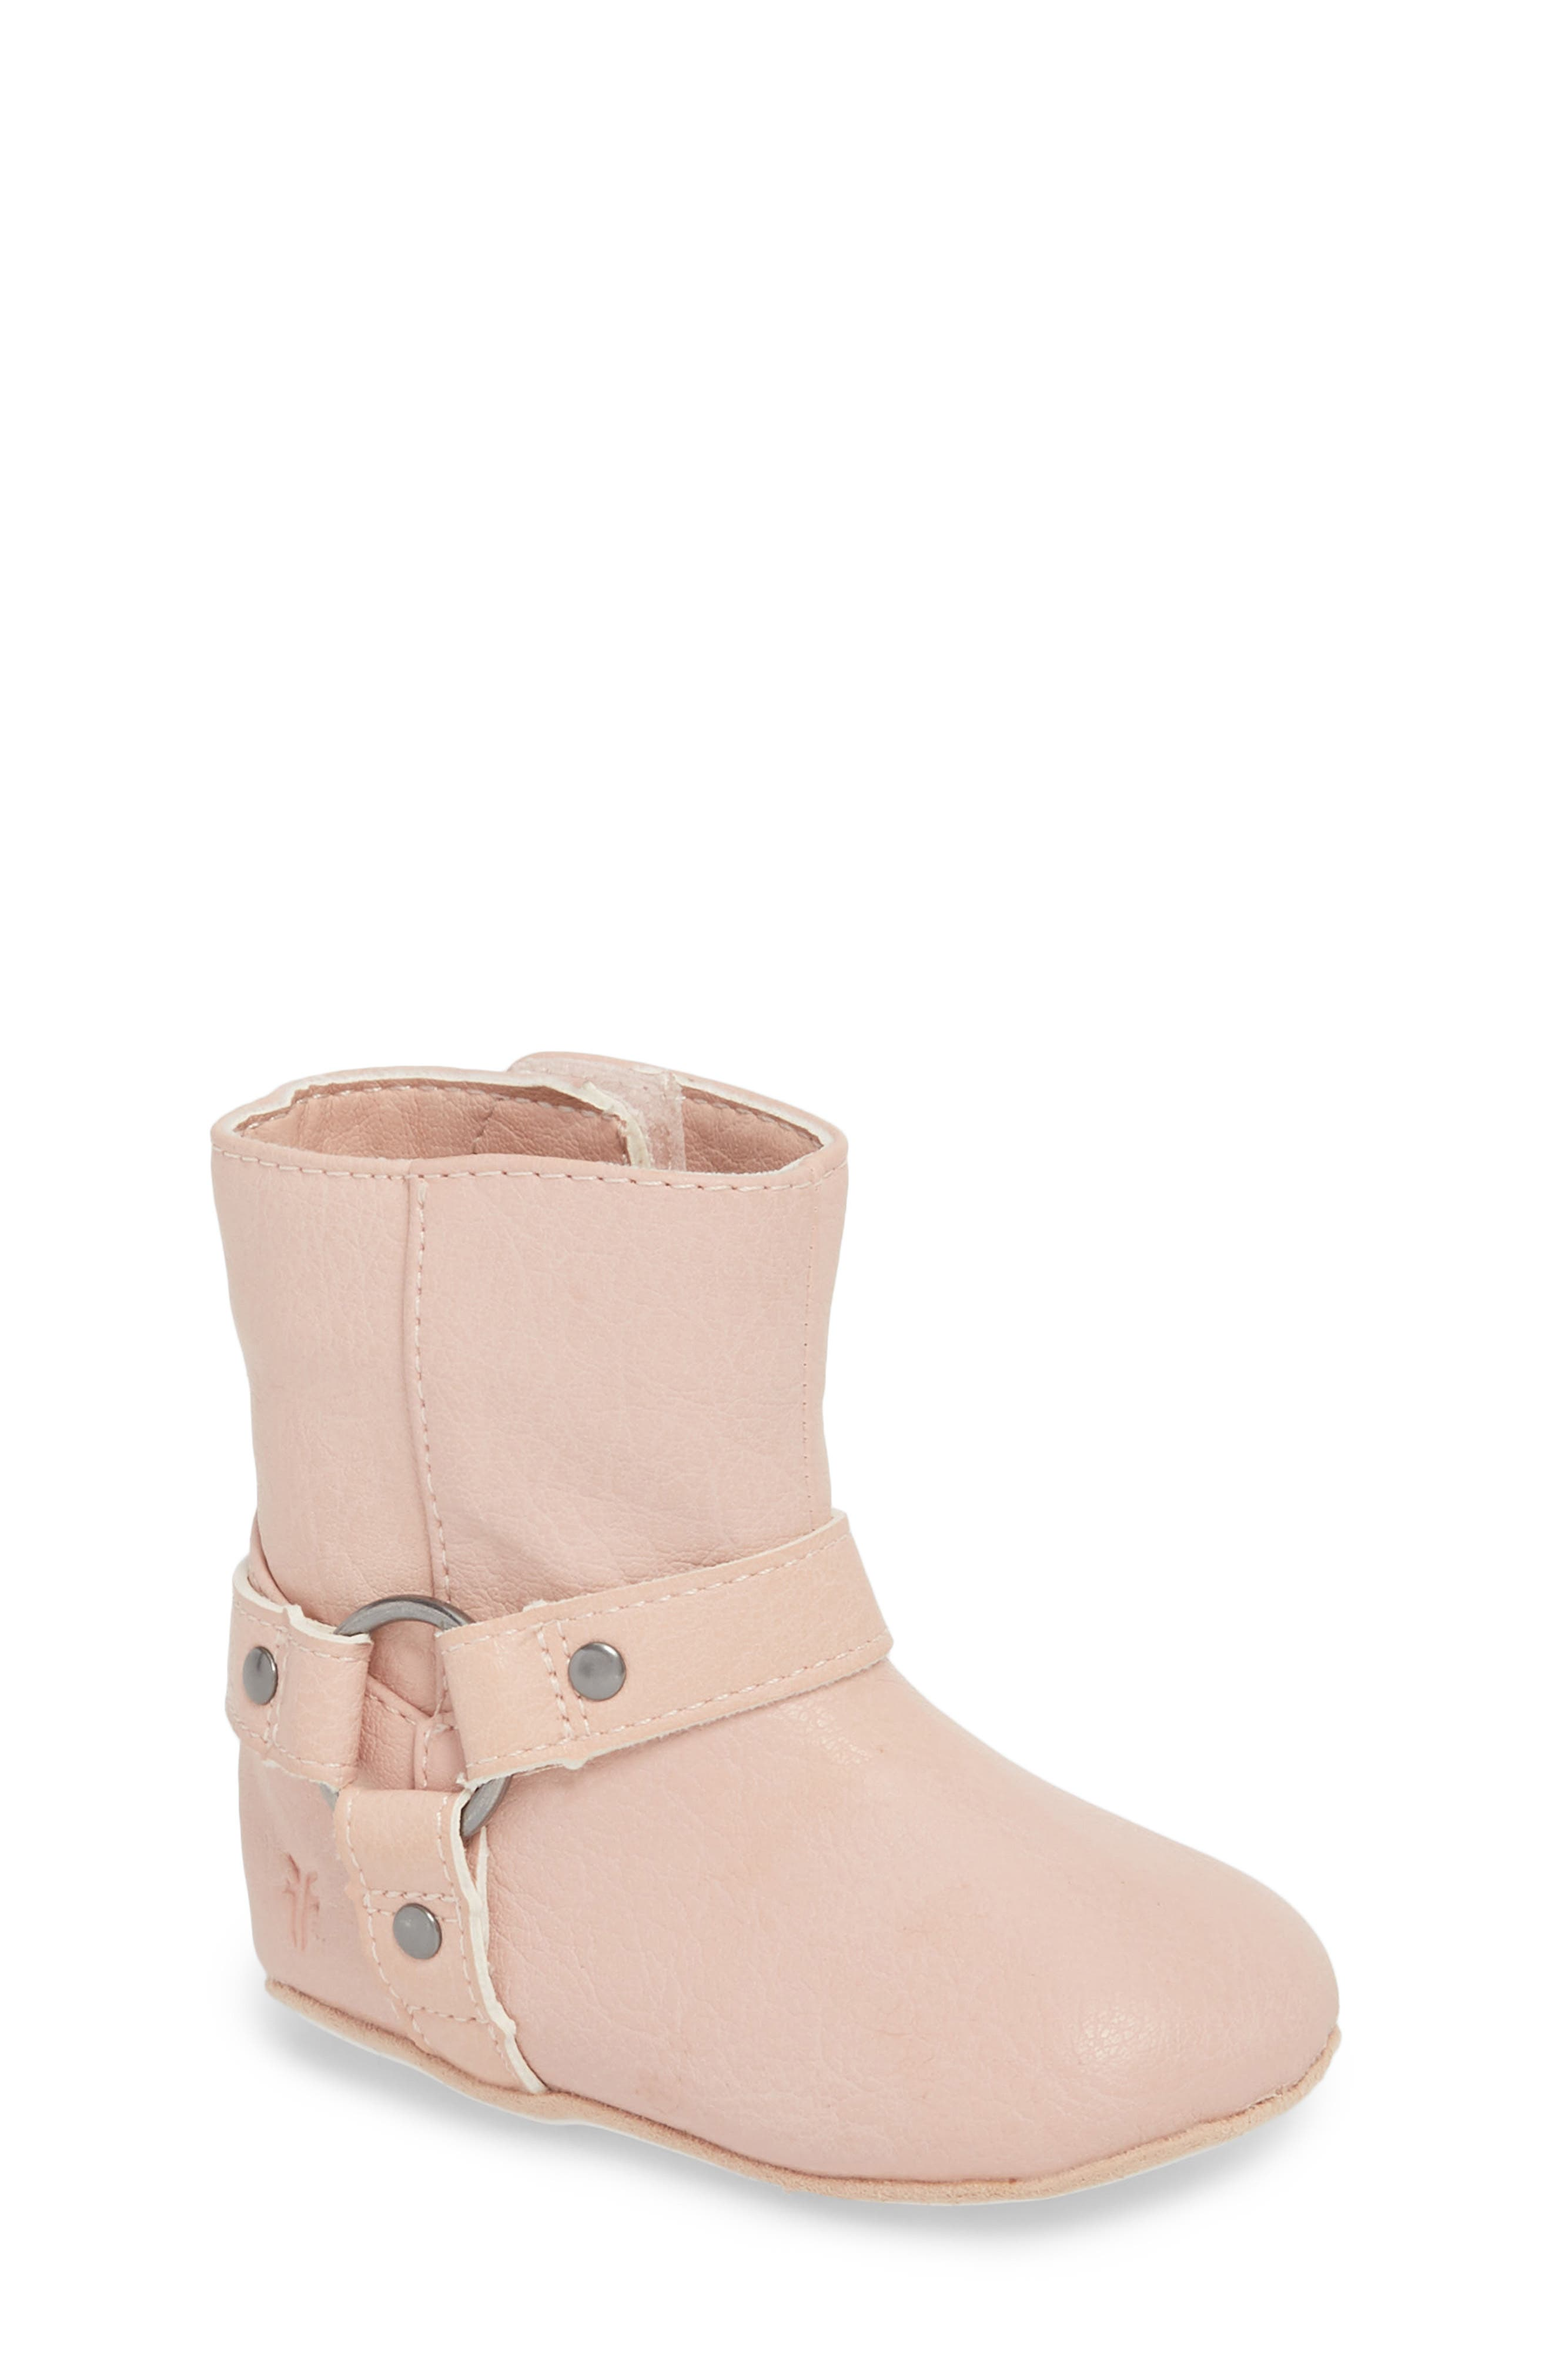 Harness Boot Crib Shoe,                             Main thumbnail 1, color,                             Baby Pink